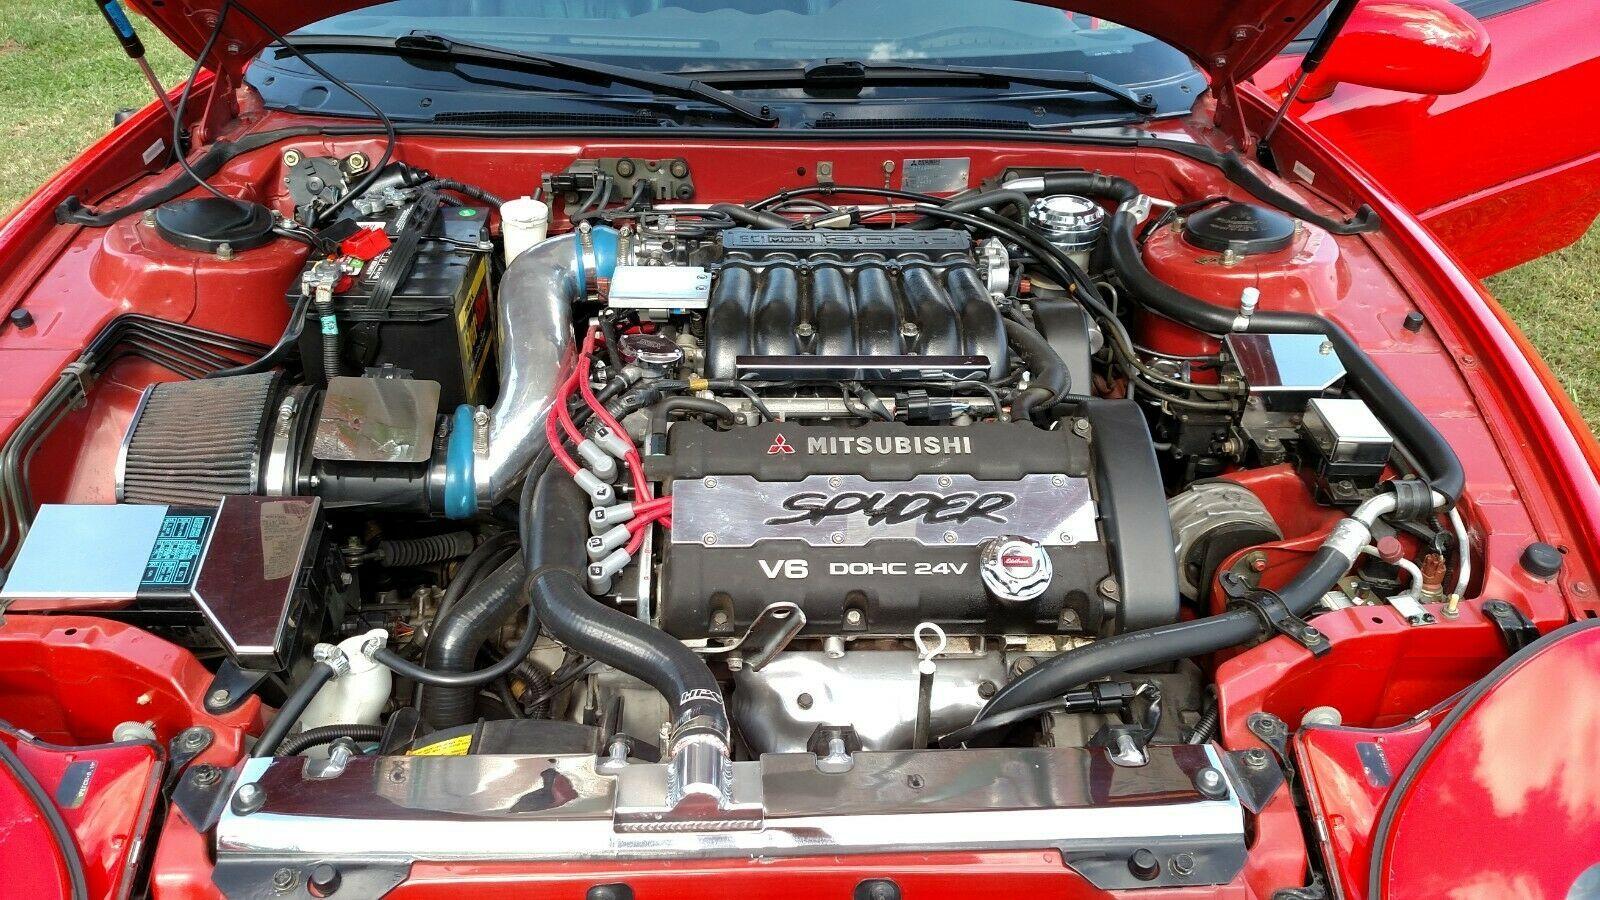 Used 1995 Mitsubishi 3000gt 1995 Mitsubishi 3000gt Sl Spyder Show Car Red Ext Black Dark Gray Interior 2020 Is In Stock And For Sale 24carshop Com Mitsubishi 3000gt Mitsubishi Dark Black